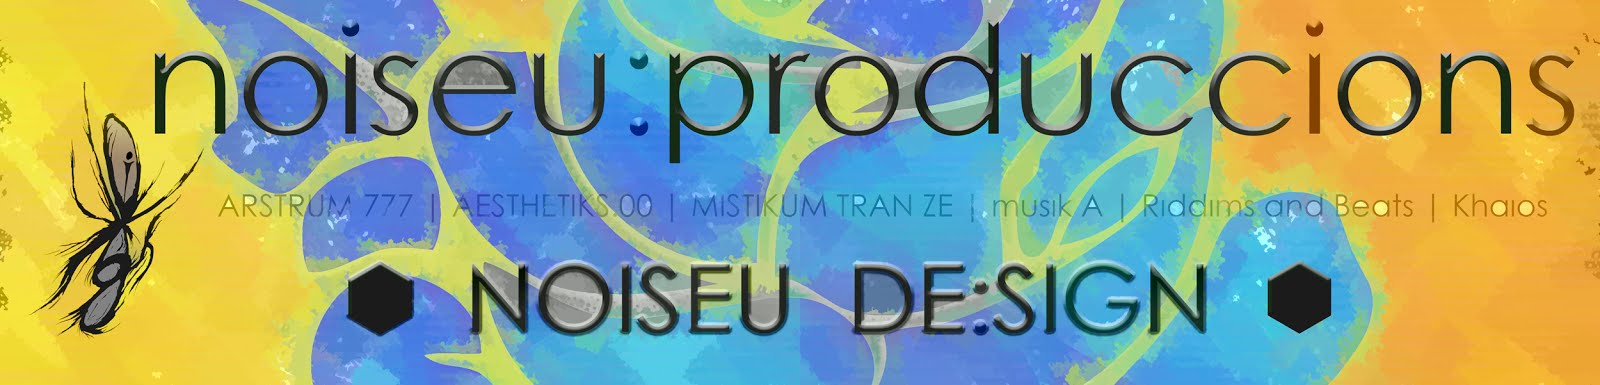 Noiseu Produccions | NOISEU DESIGN | NOISEU DE:SIGN